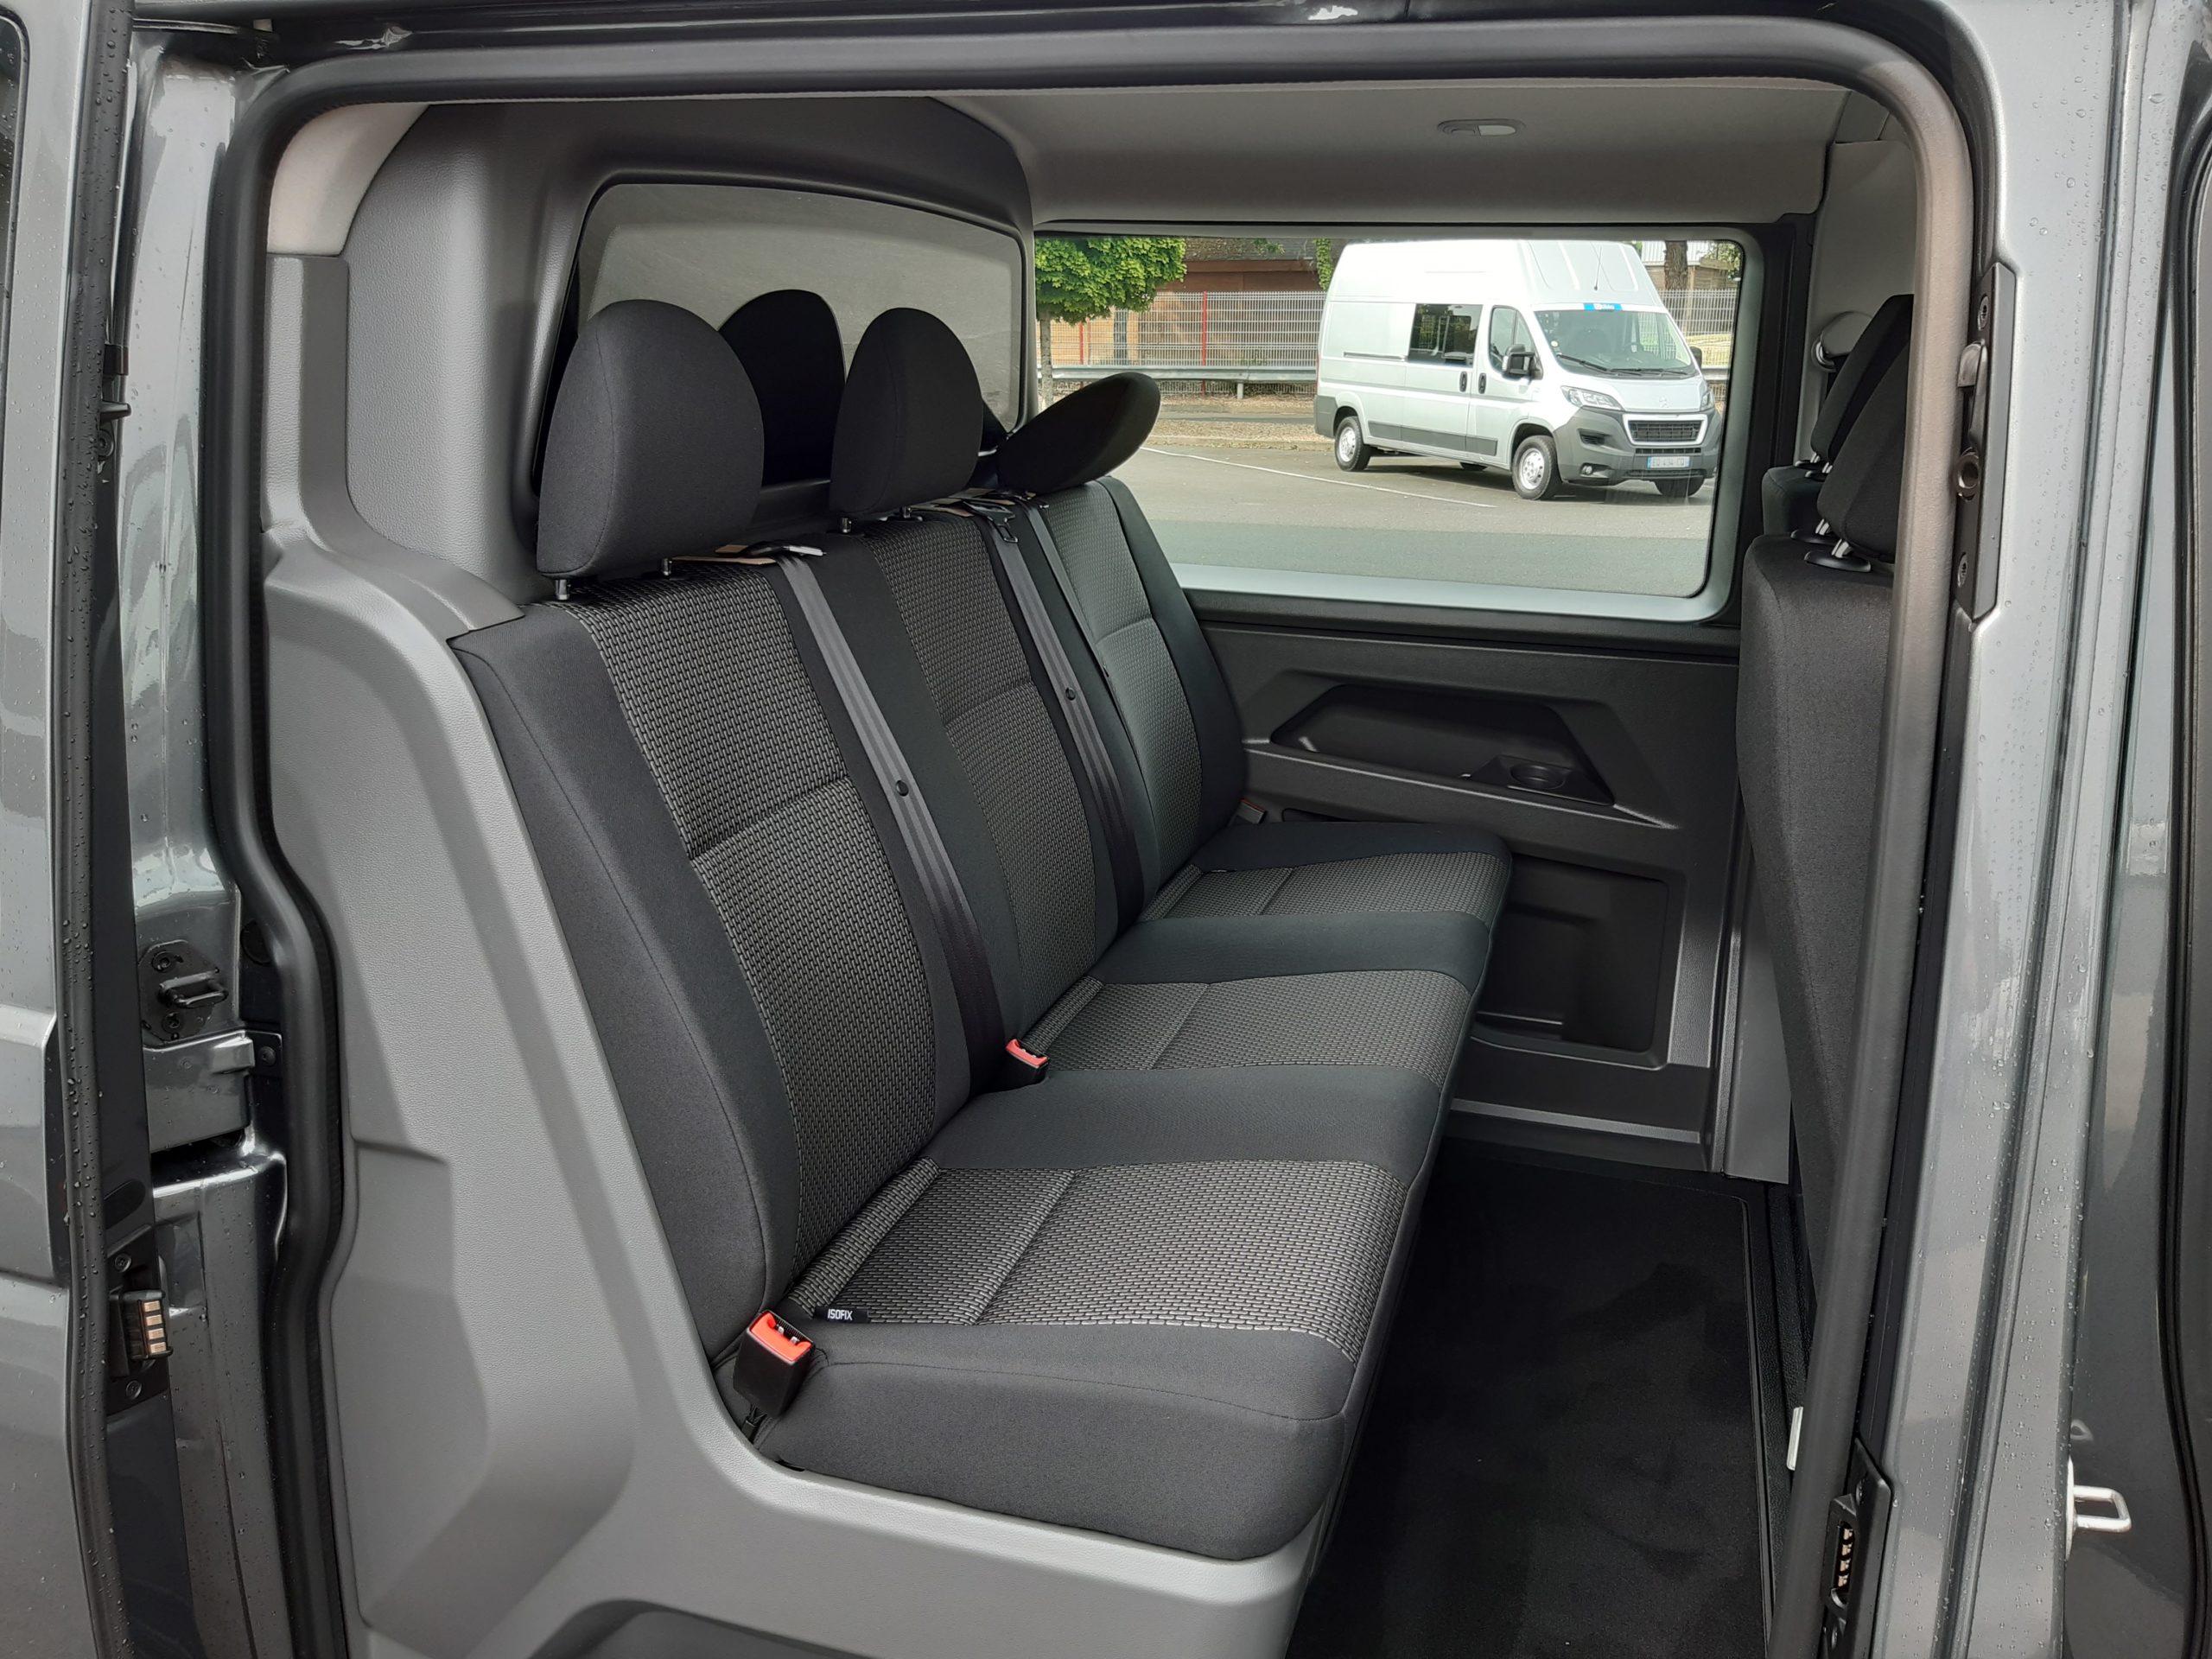 Location d'un fourgon compact double cabine - Volkswagen T6-1 Cabine APP -Vue11